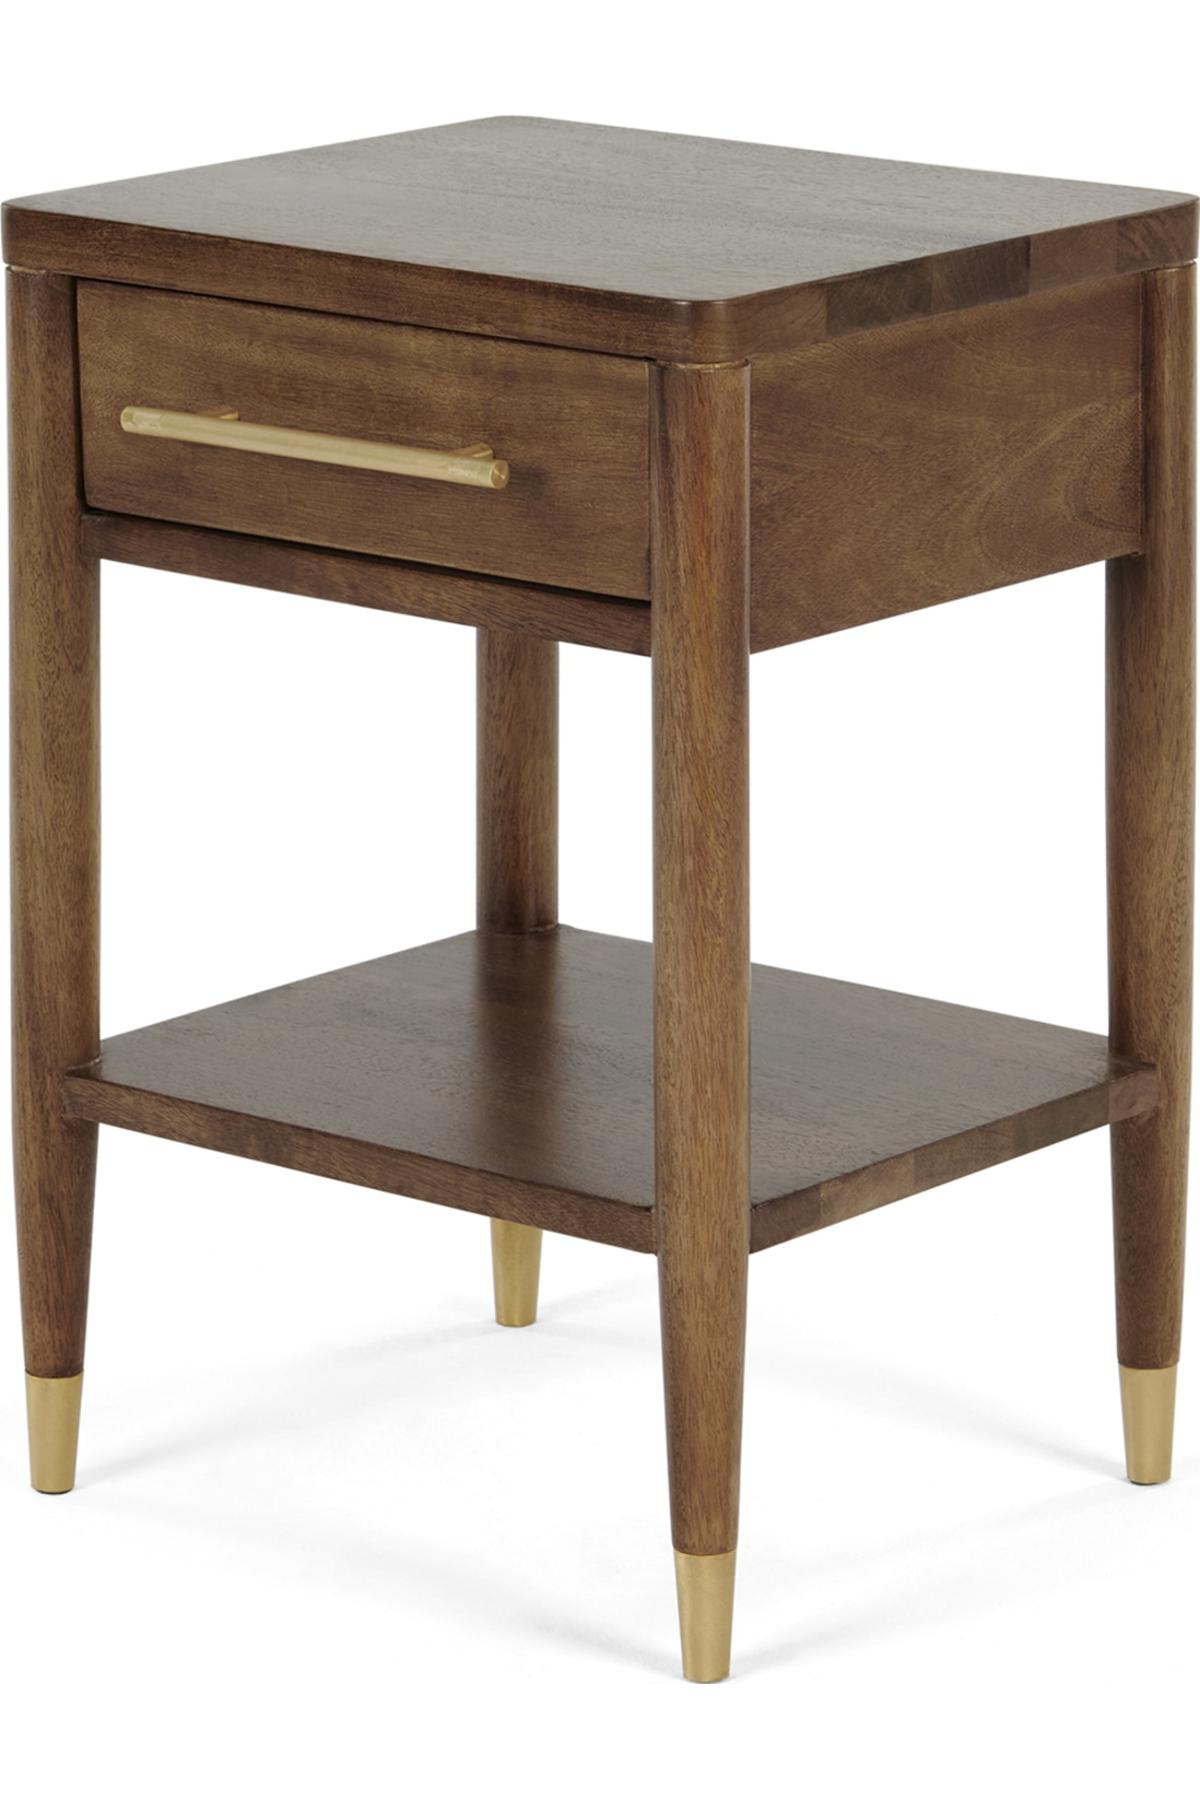 Hix Bedside Table Mango Brass Bedside Table Decor Table